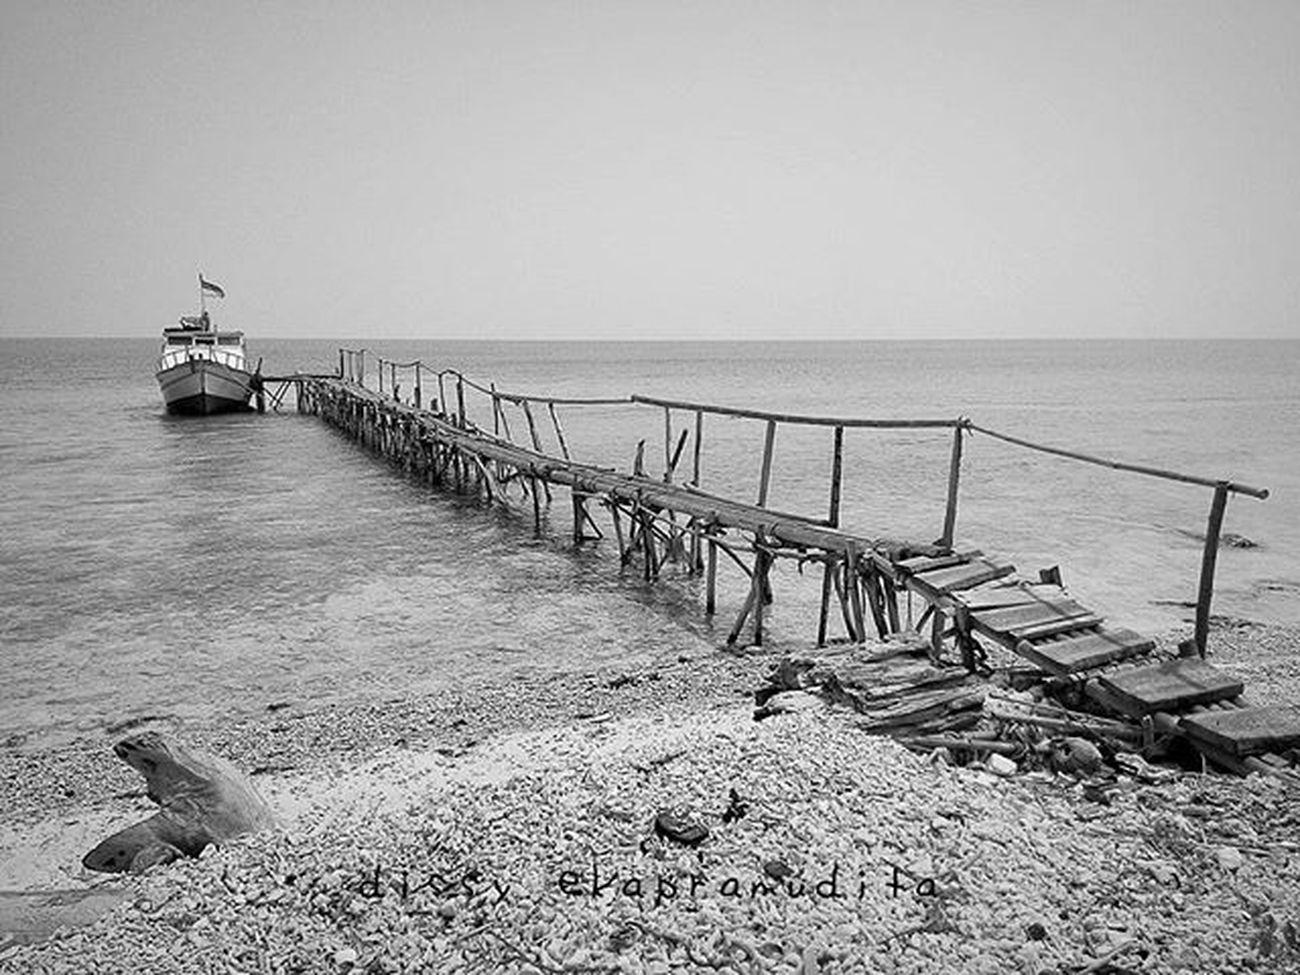 Fragile Jetty Dermaga Fragile Beach PulauTunda INDONESIA 1000kata Nationalgeographic Asiangeographic Pewartafotoindonesia Instalike Instagram Instagood Instadaily Instamood Popularphoto Blackandwhite Asuszenphone5